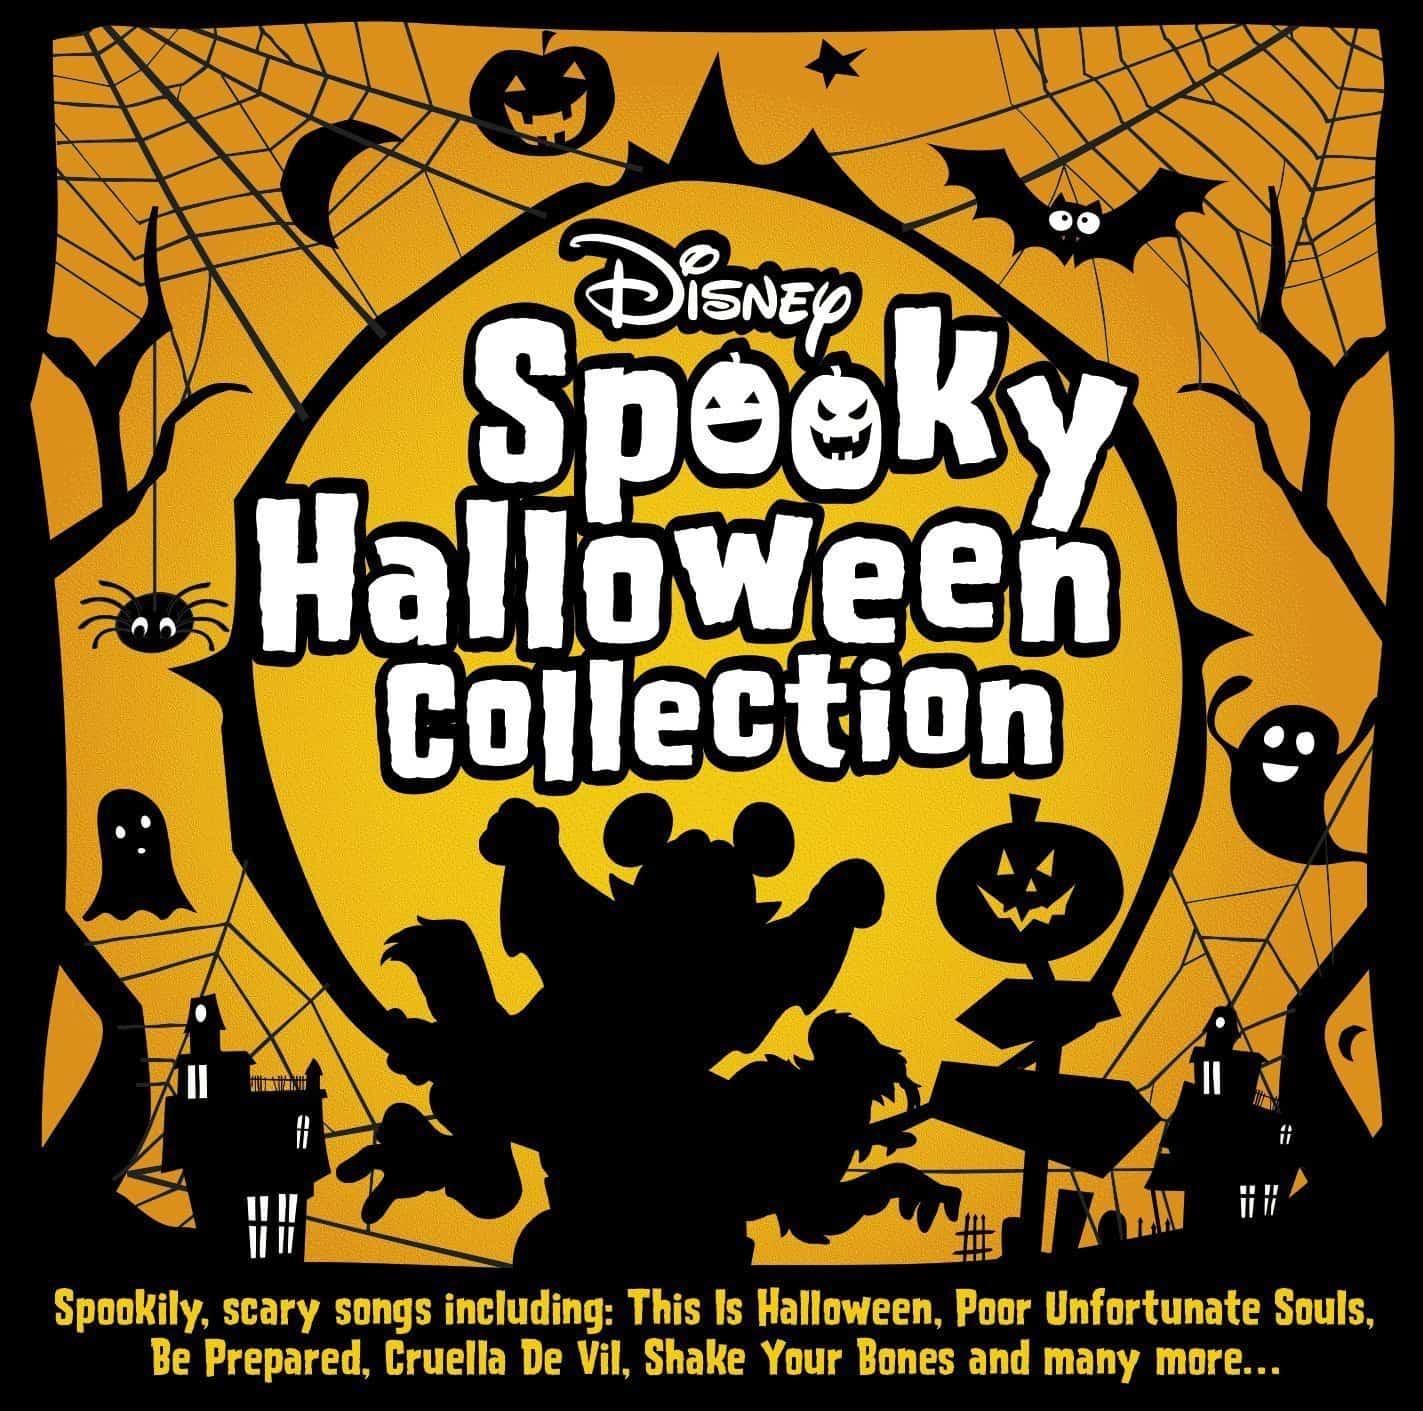 disney spooky halloween collection album review | | diskingdom